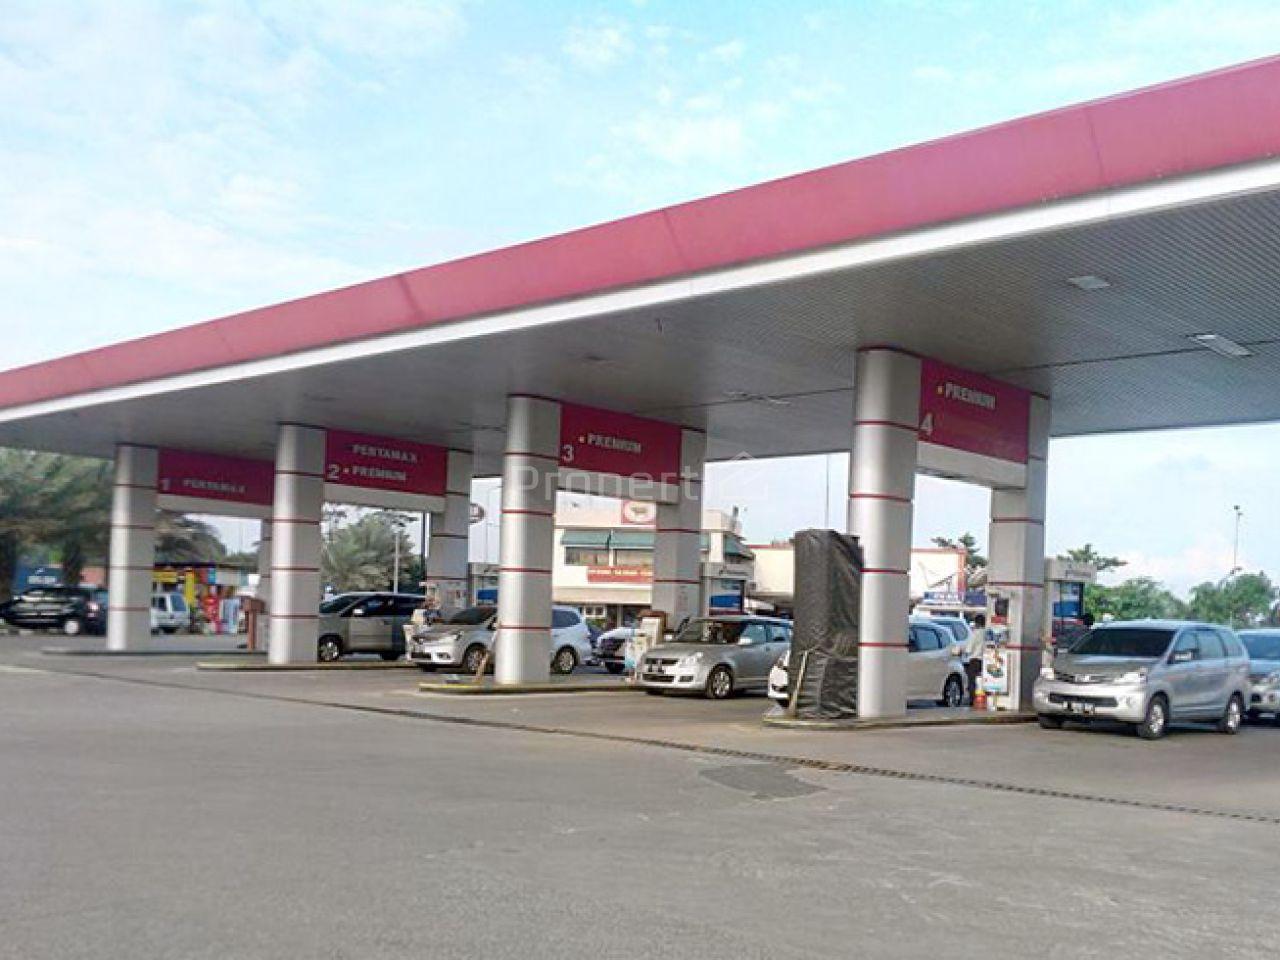 Strategic Gas Station at Rest Area Km 42 Karawang, Jawa Barat